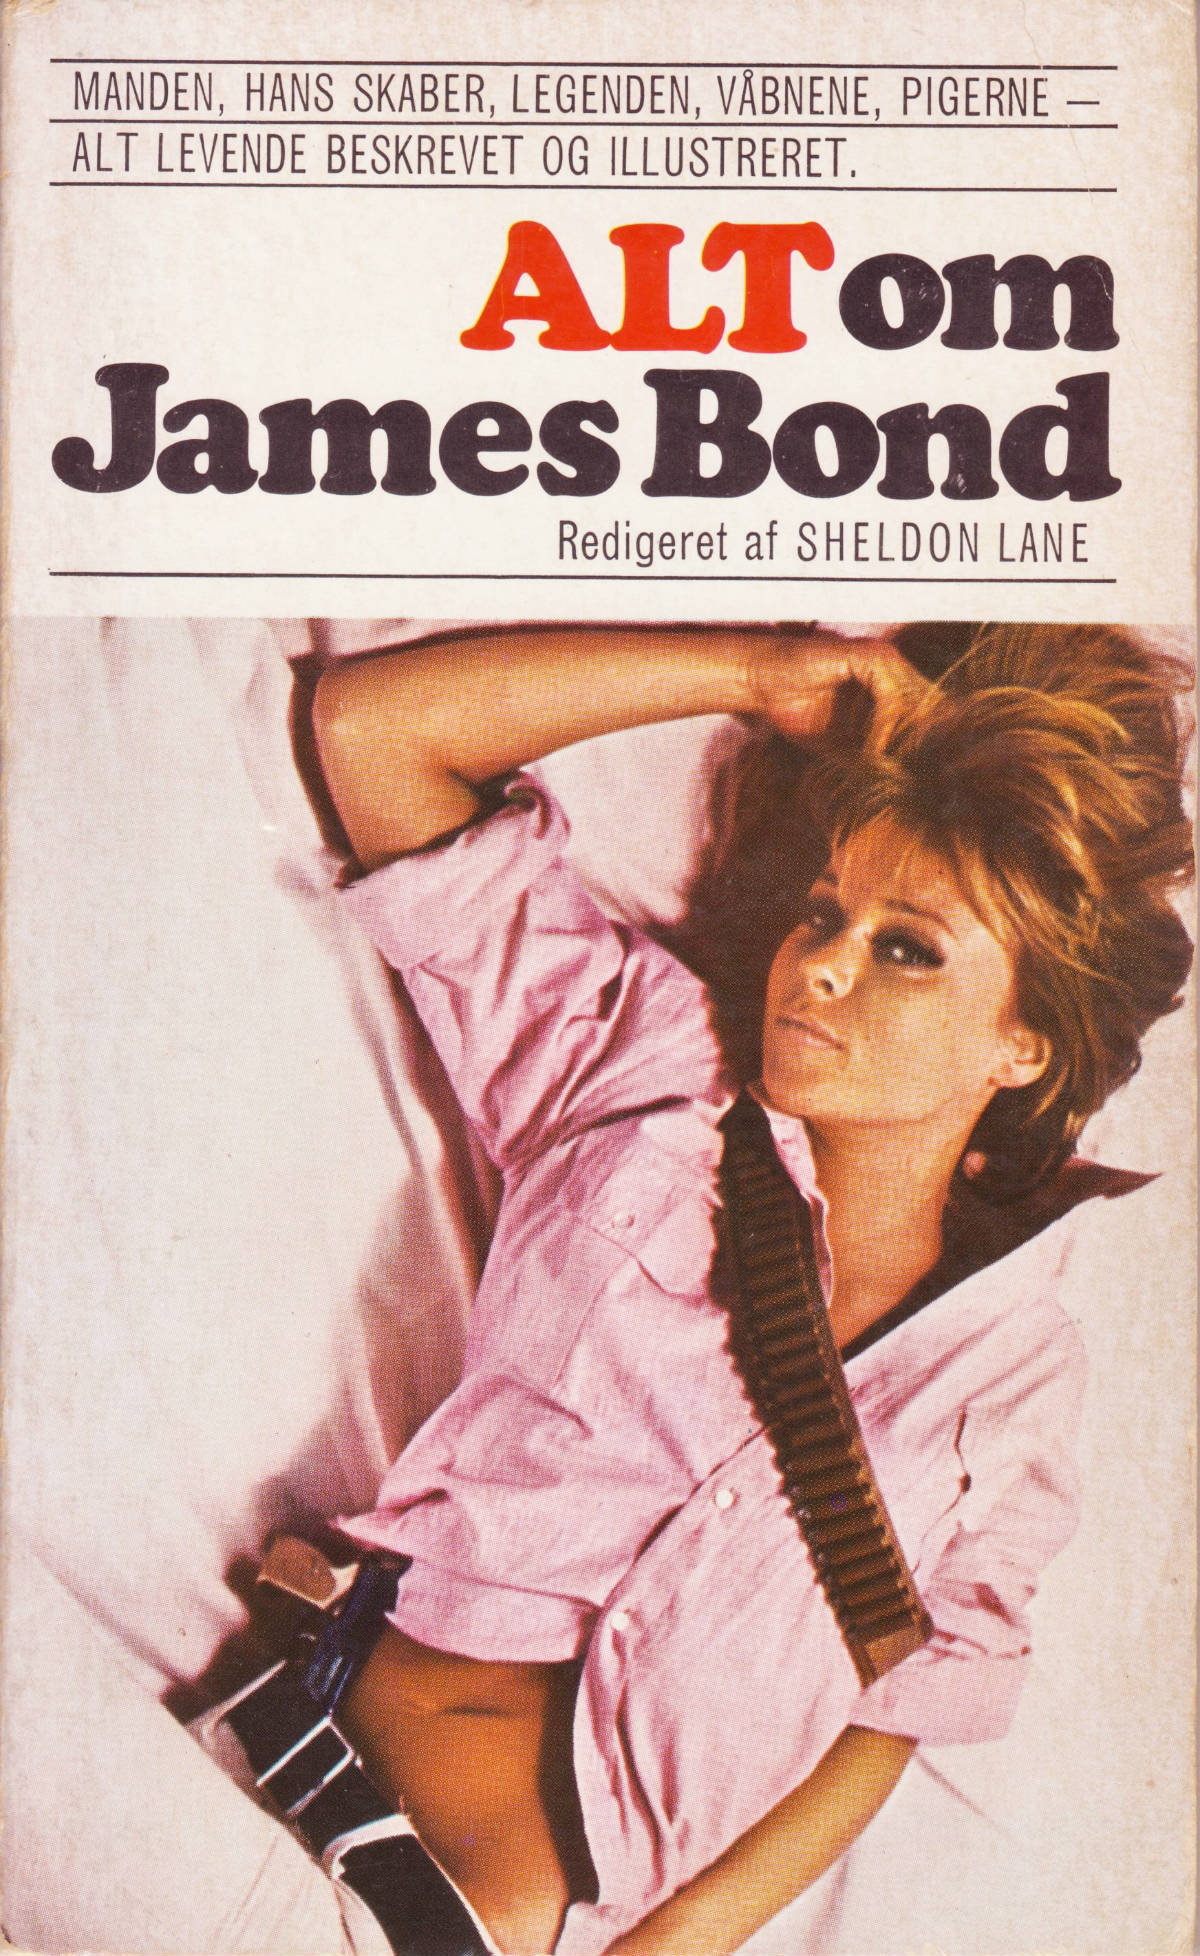 """Alt om James Bond"" (1967): Danish front cover"